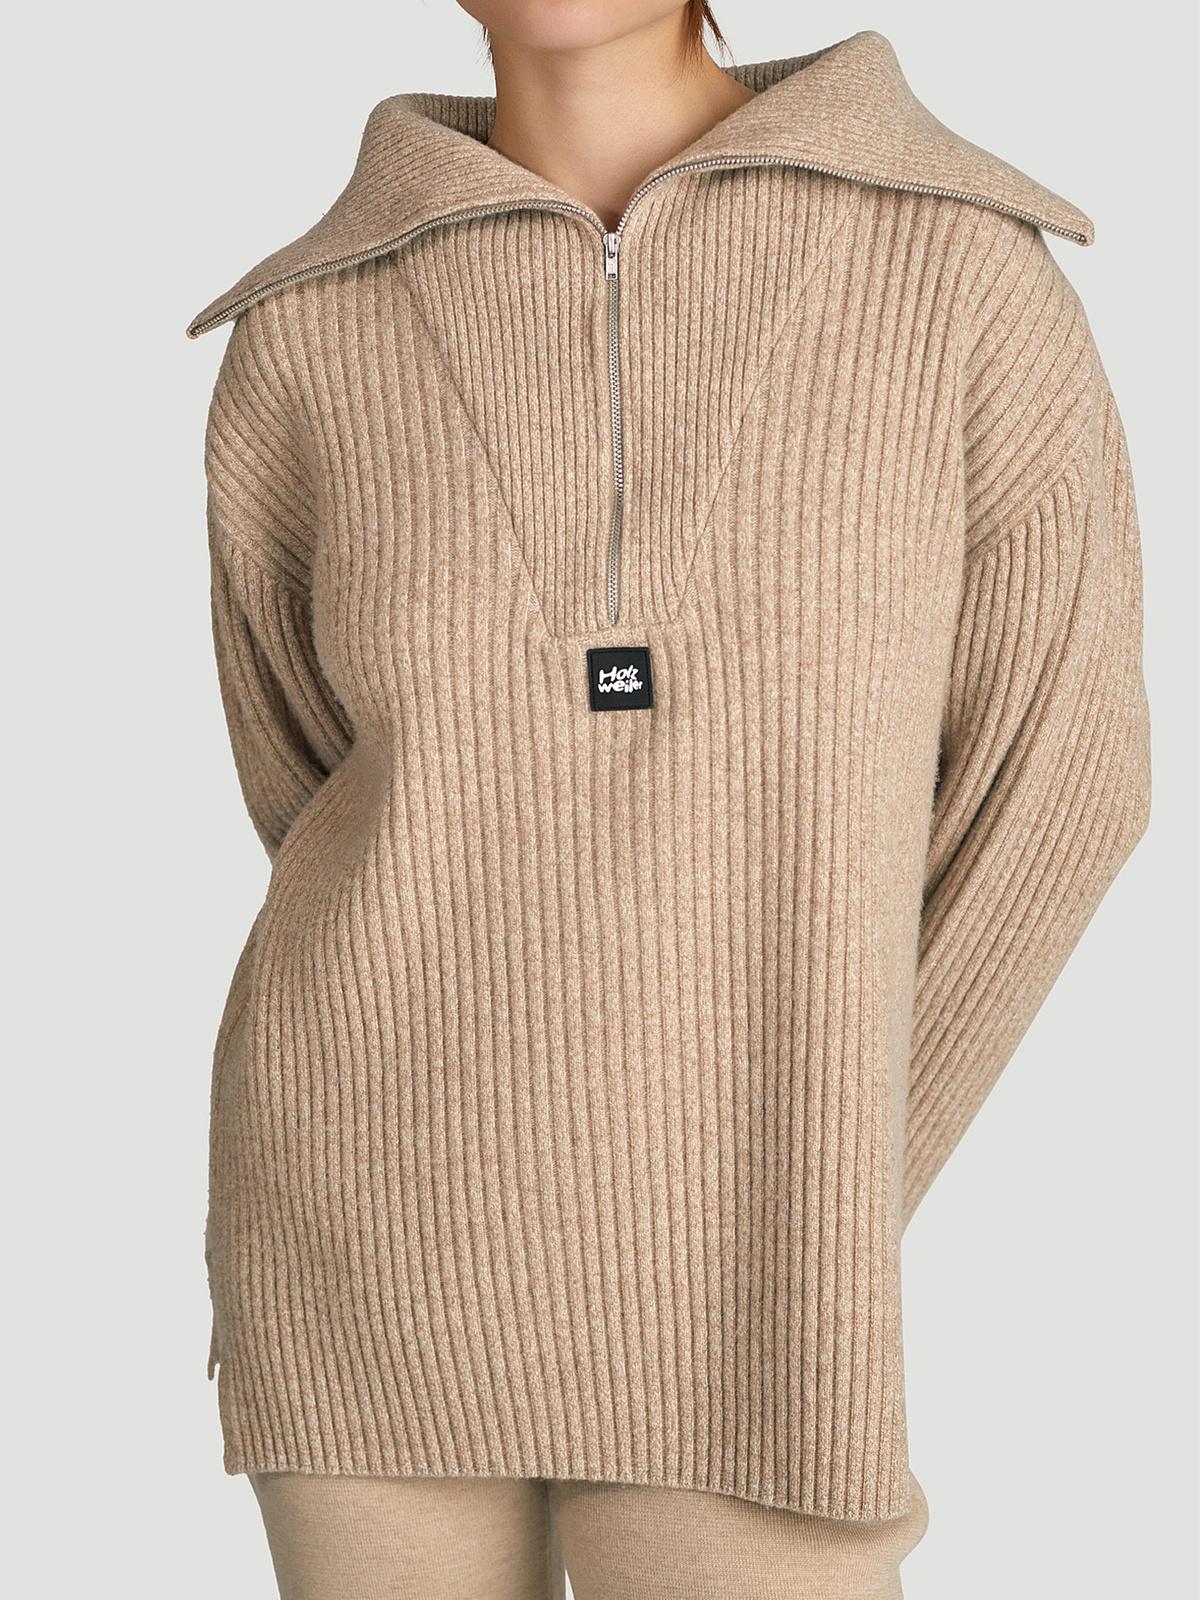 React Knit Sweater  Sand 1